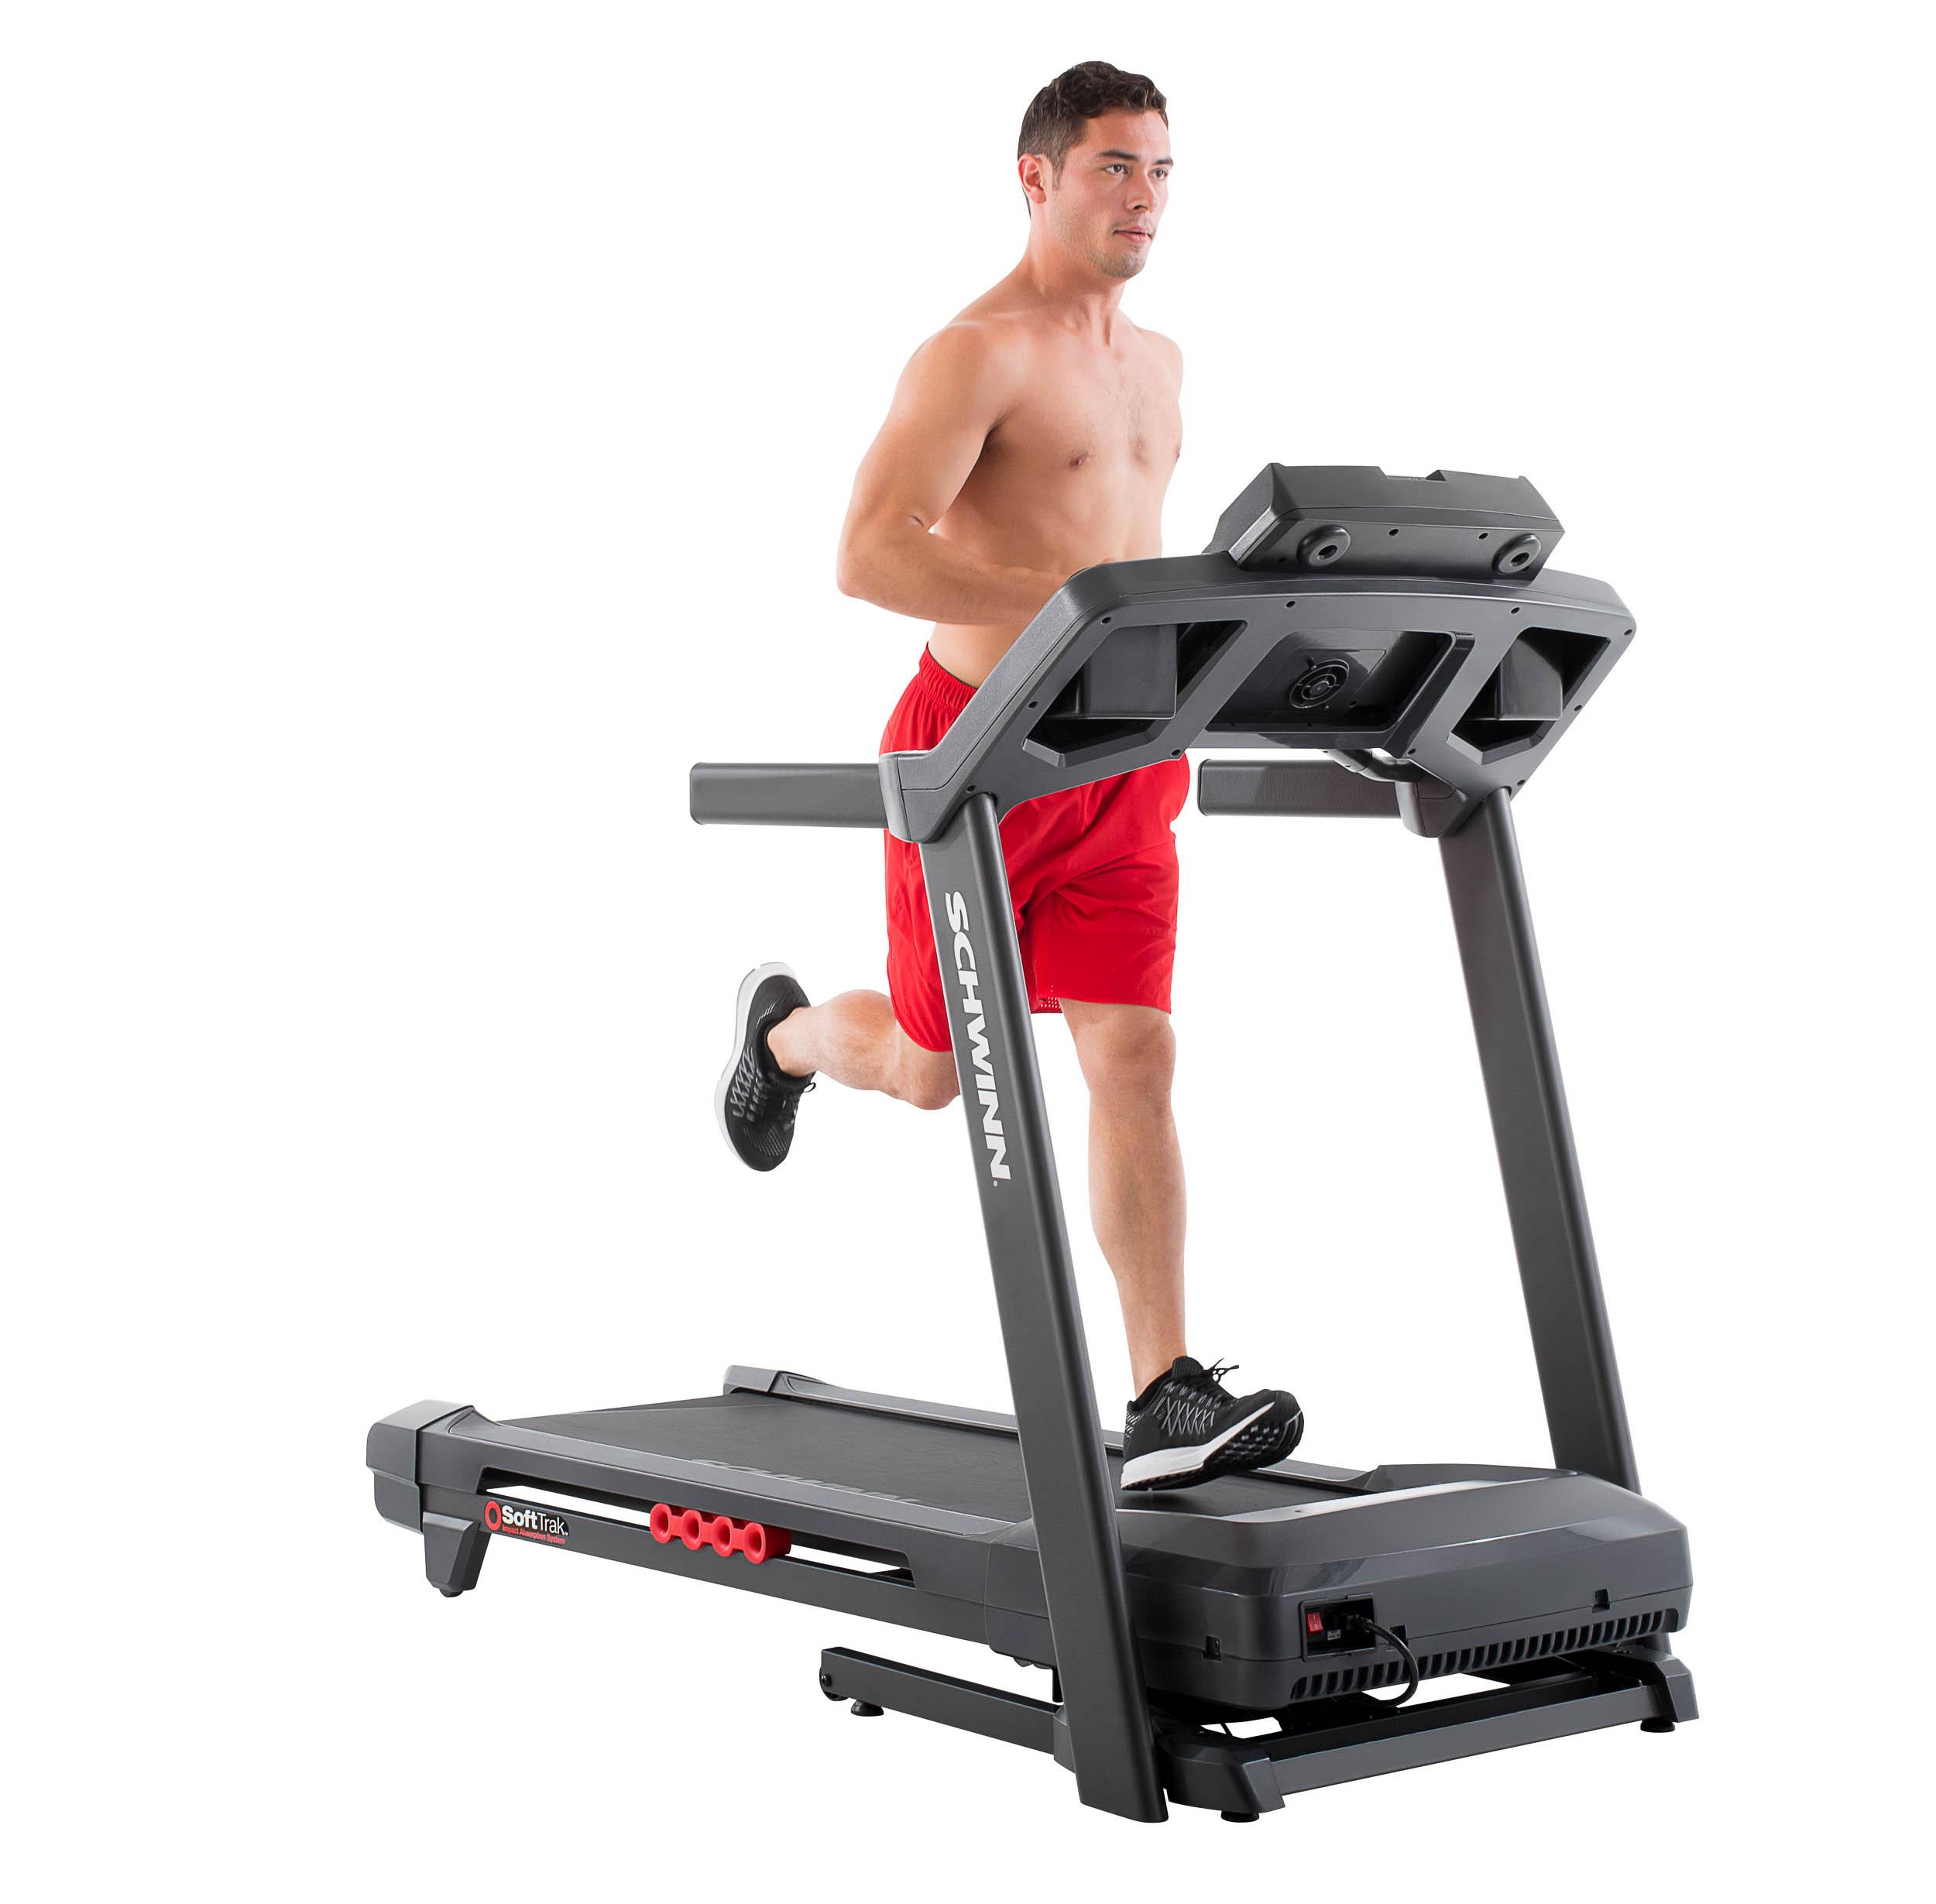 Nautilus_Direct_116099_Schwinn Treadmill 830 Studio Front 3-4 Clay_149 copy.jpg